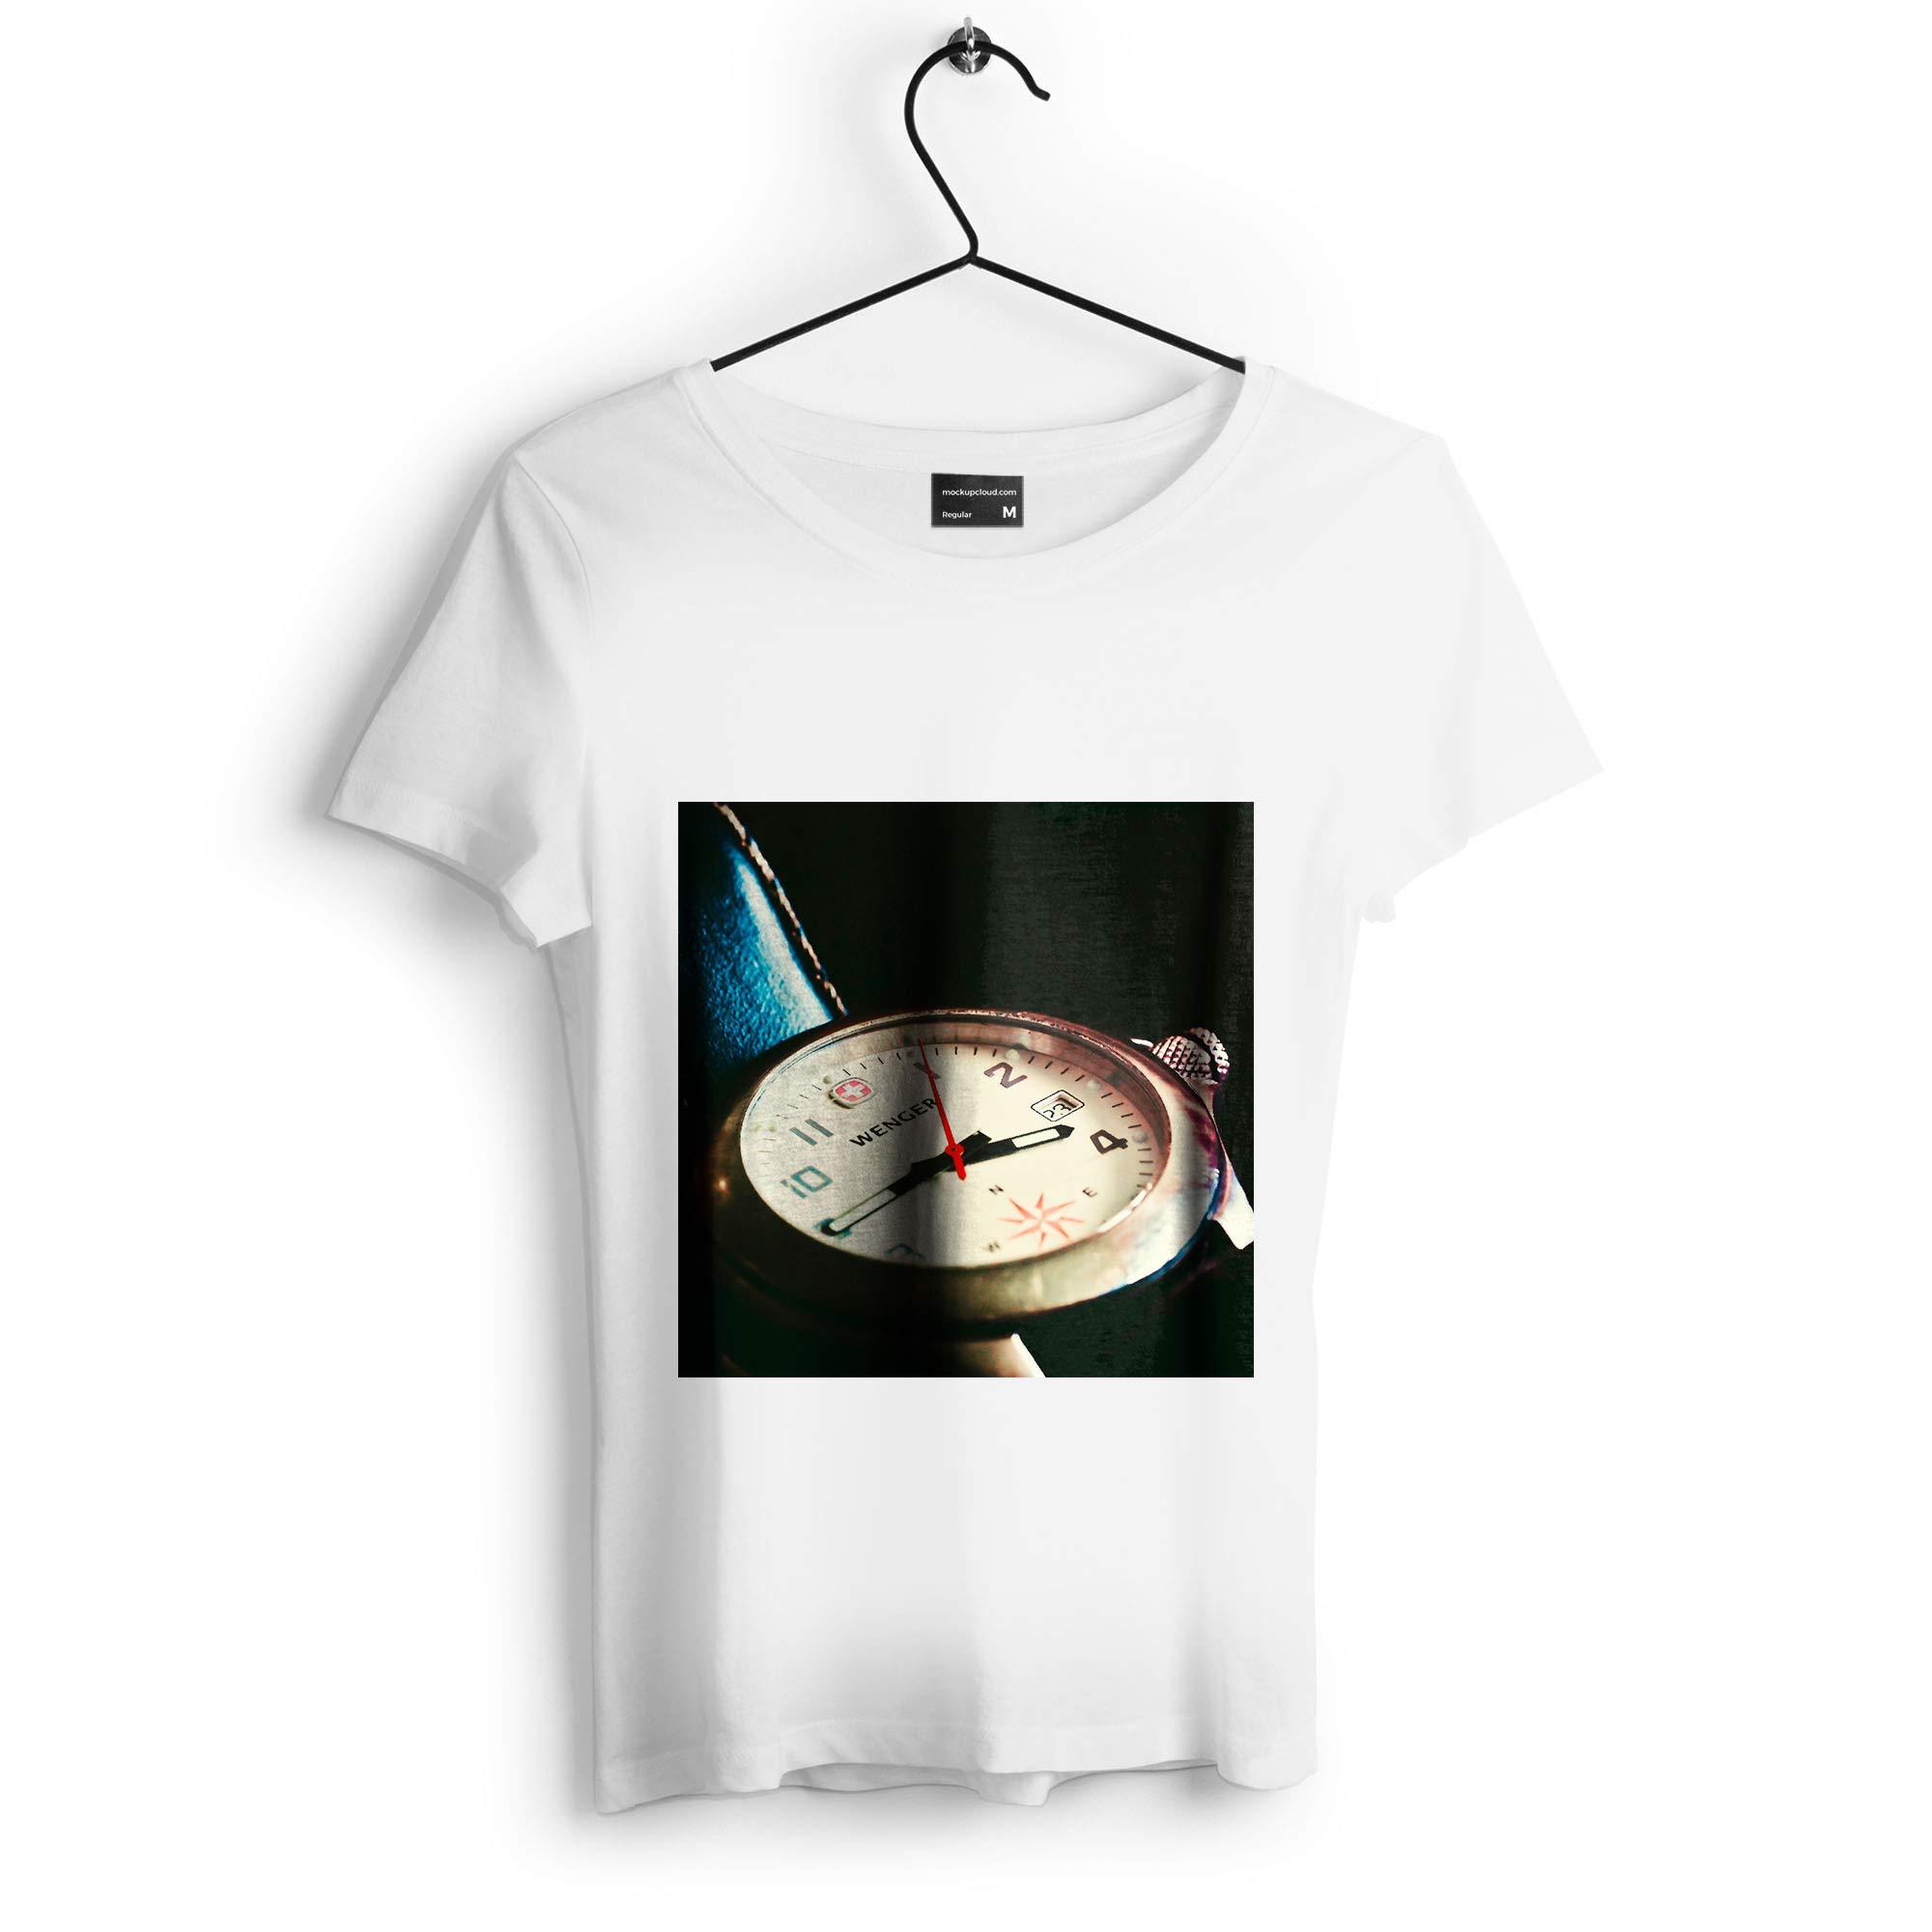 Westlake Art - Watch Close - Unisex Tshirt - Picture Photography Artwork Shirt - White Adult Medium (D41D8)